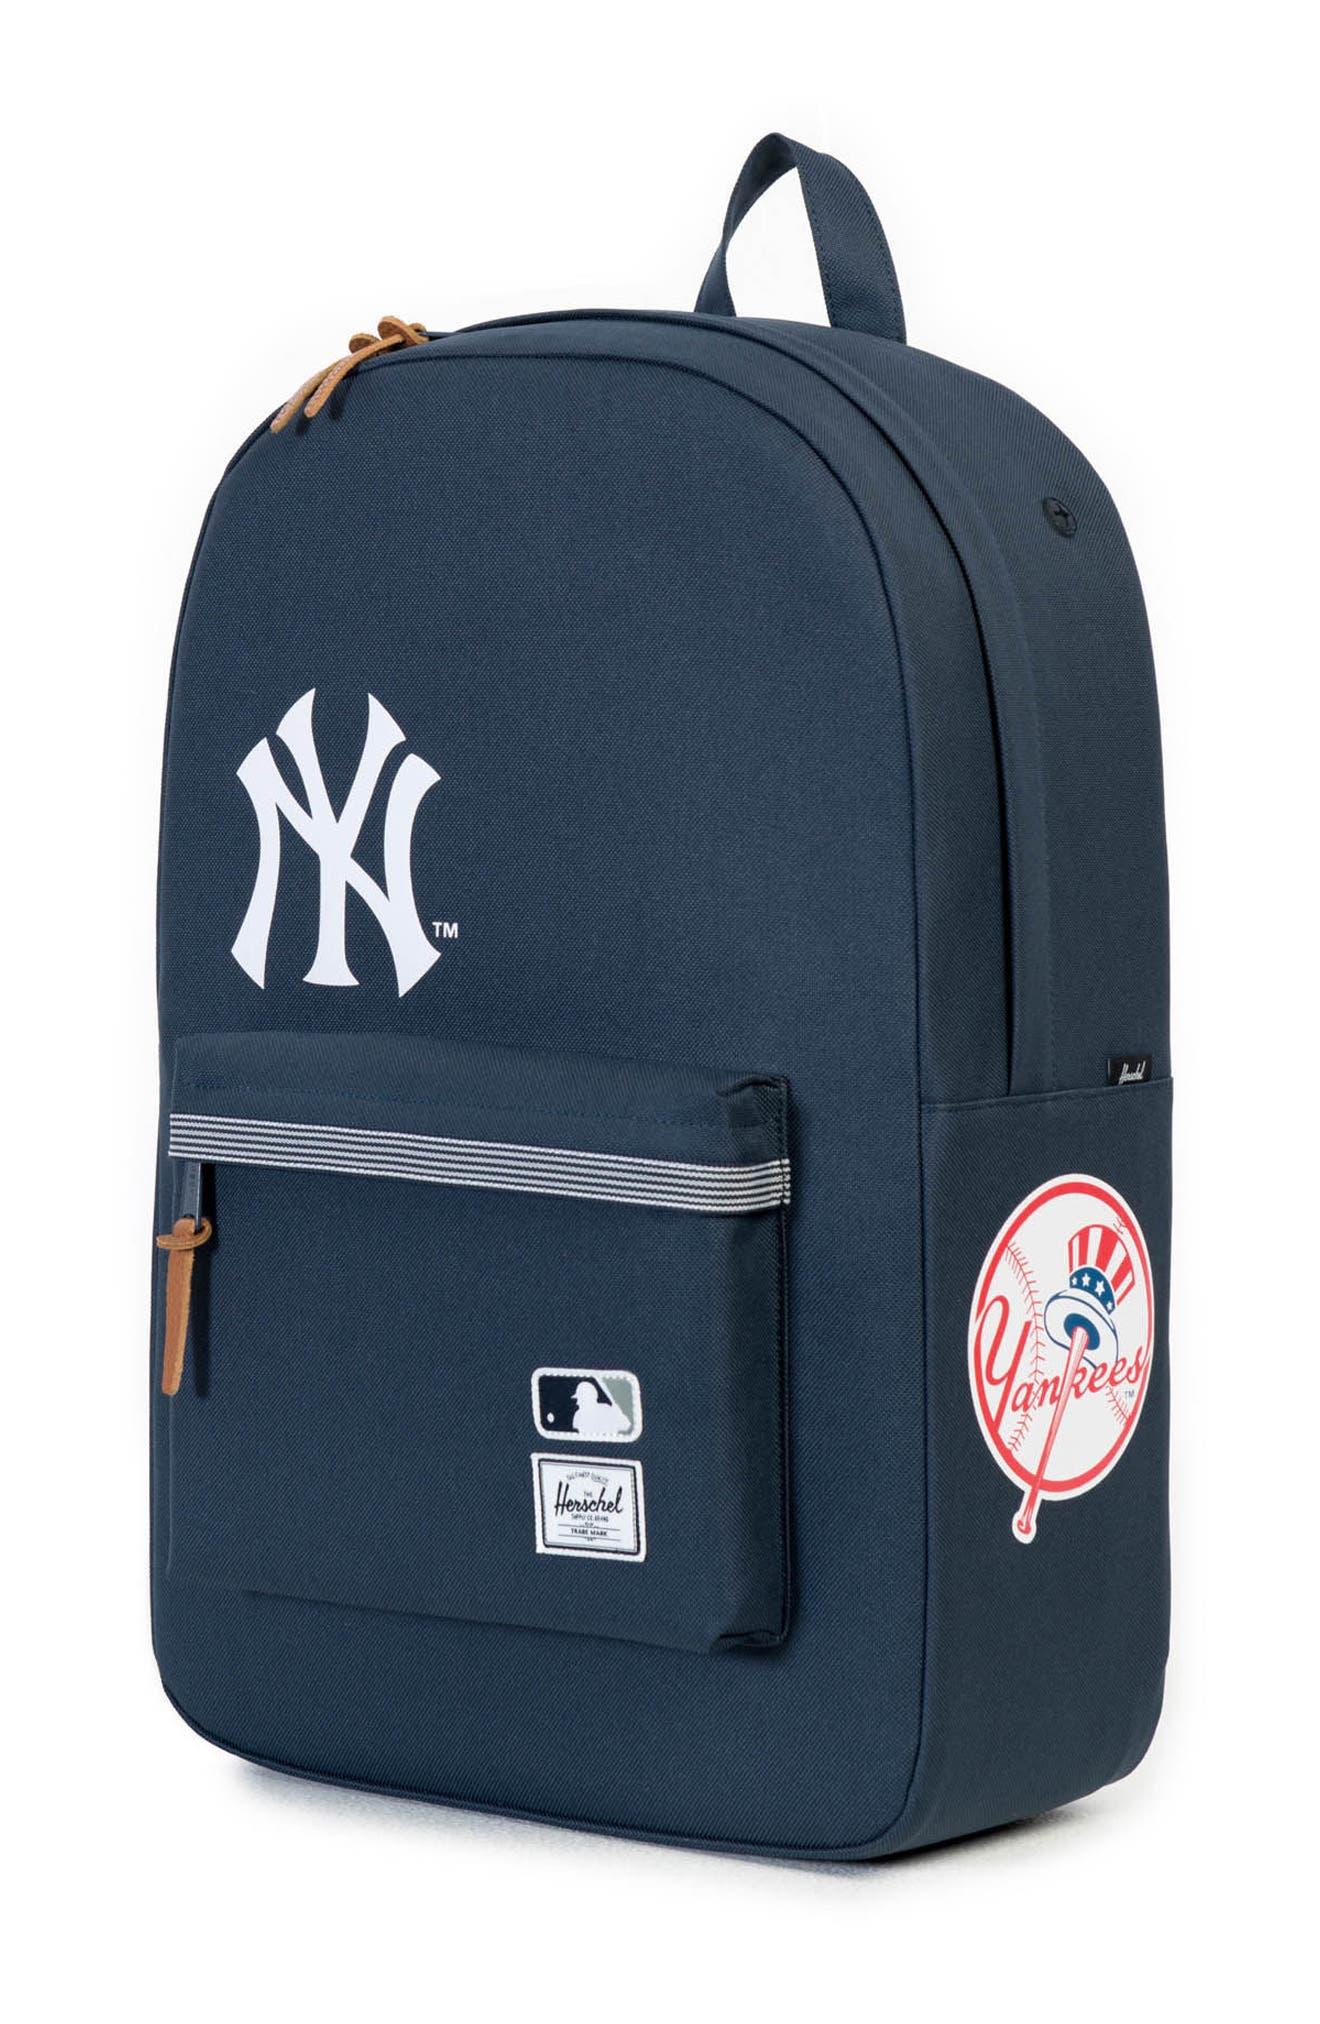 HERSCHEL SUPPLY CO.,                             Heritage New York Yankees Backpack,                             Alternate thumbnail 4, color,                             NEW YORK YANKEES